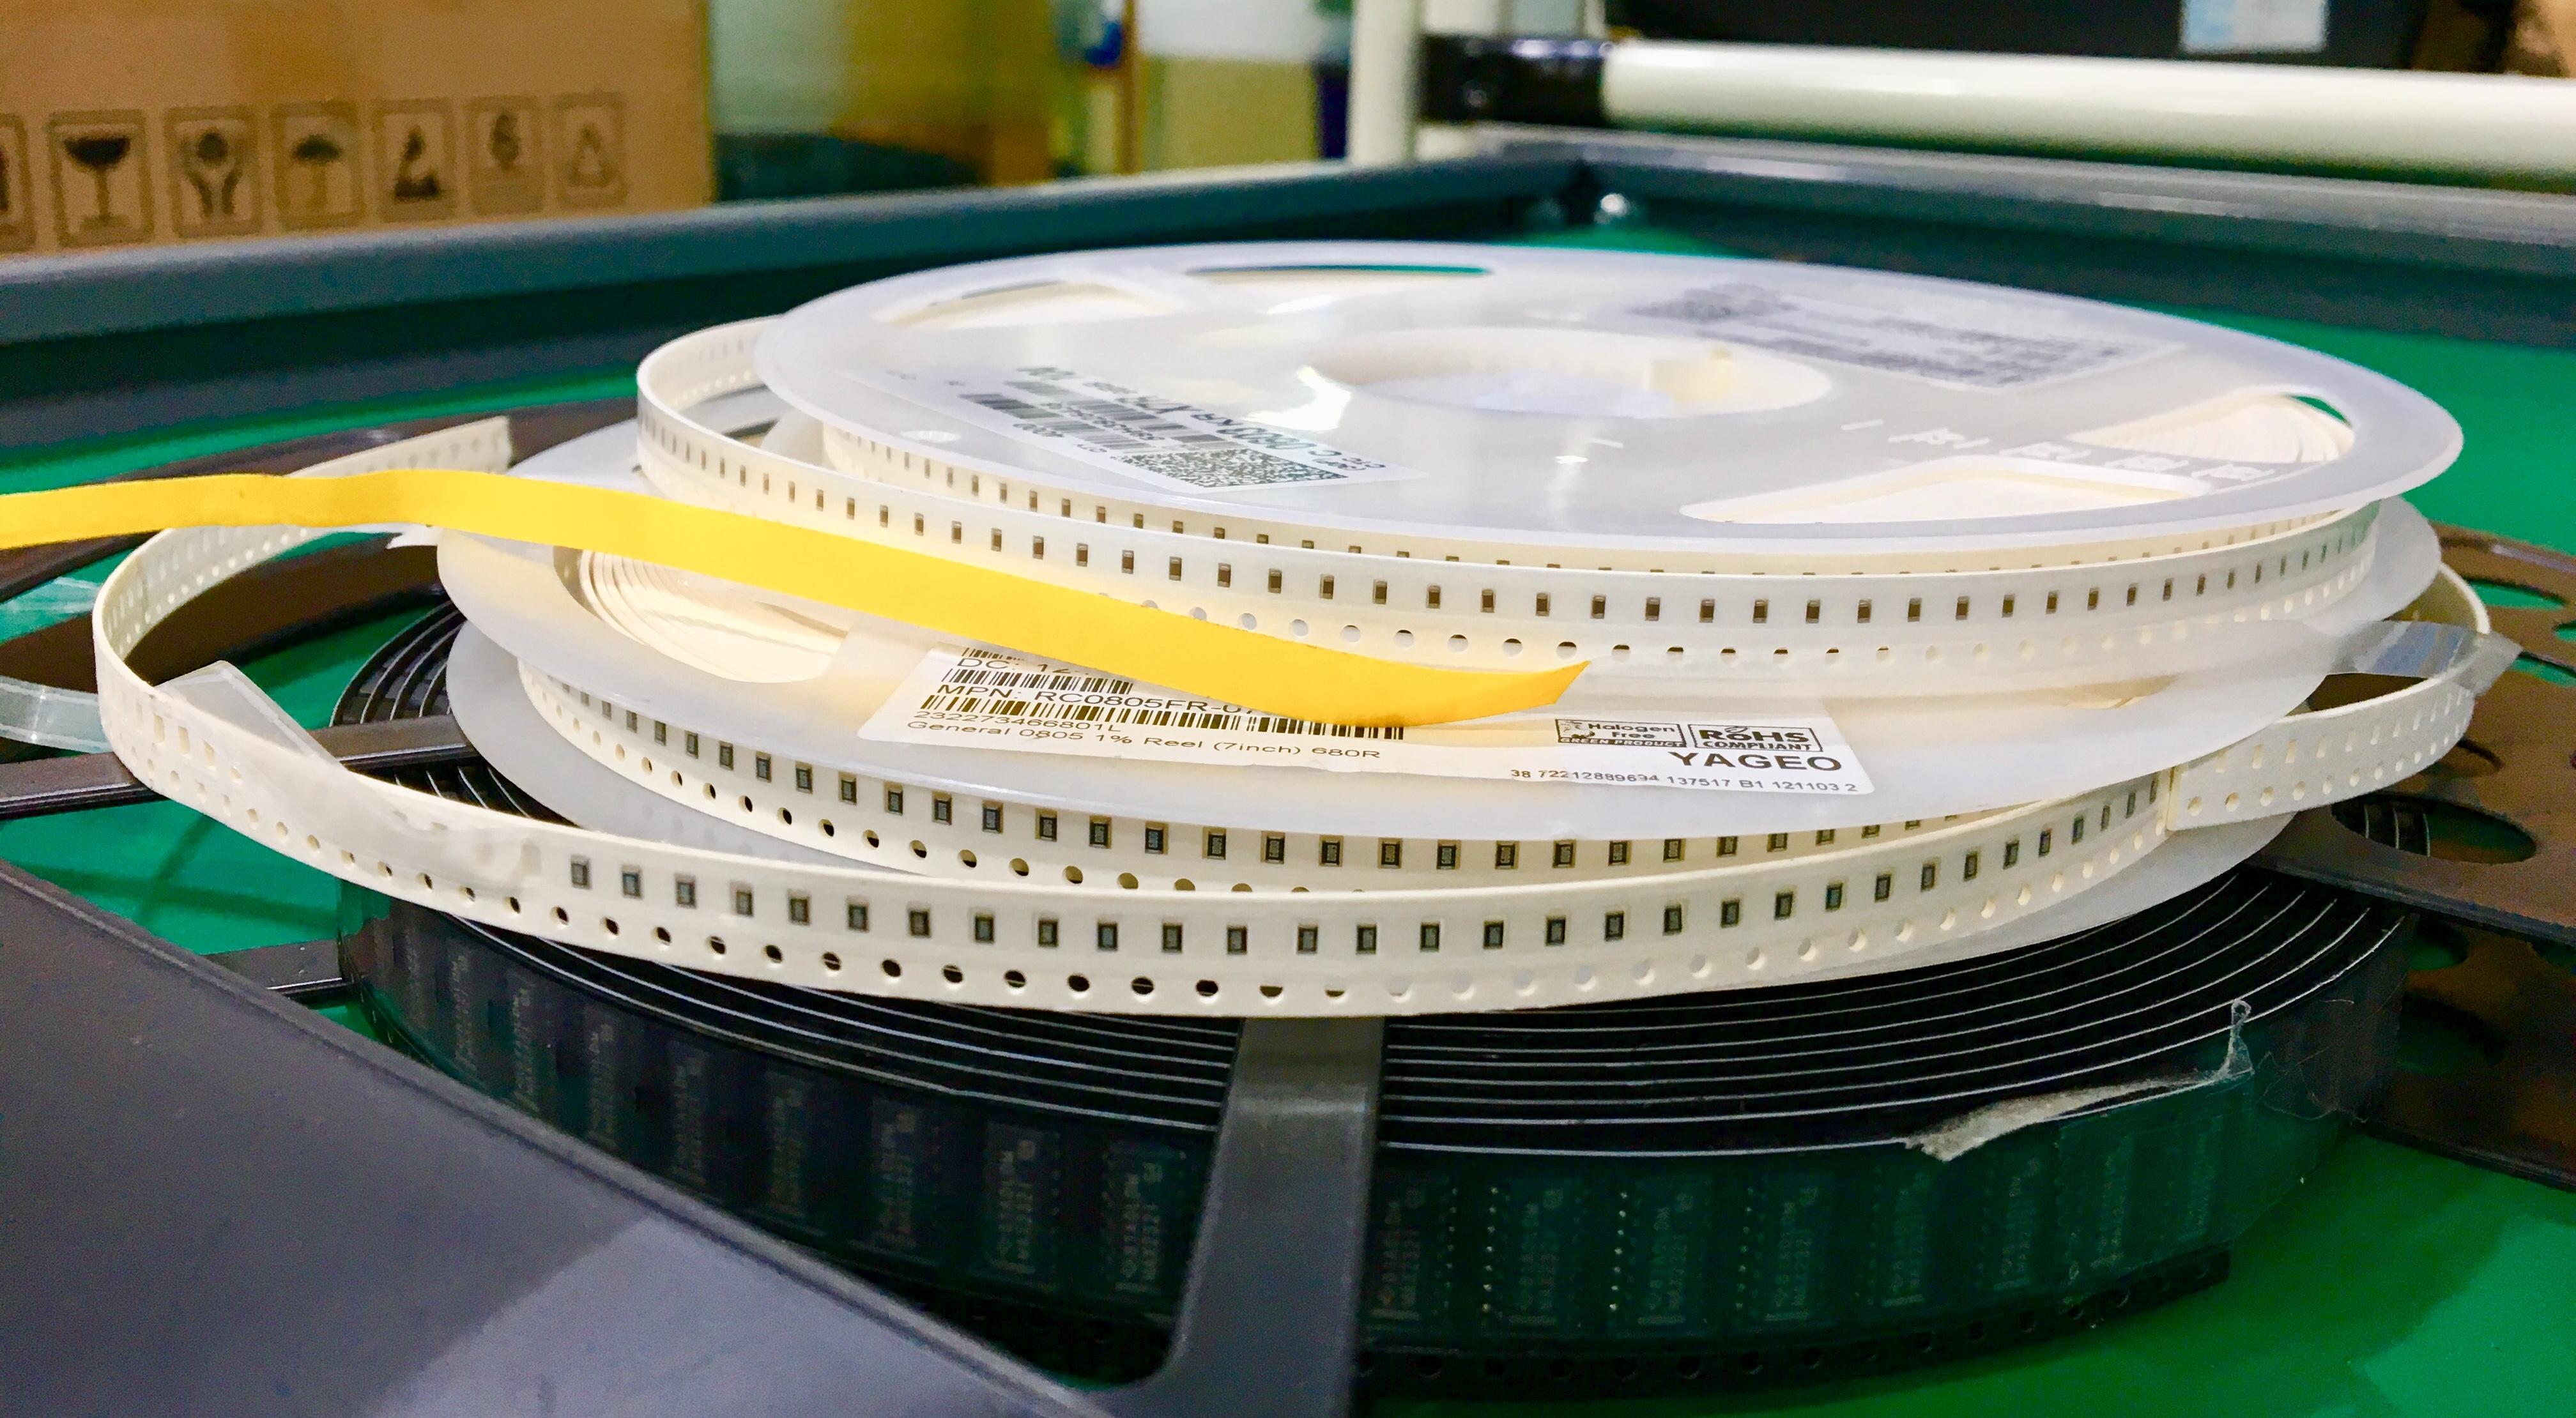 Standard part component packaging